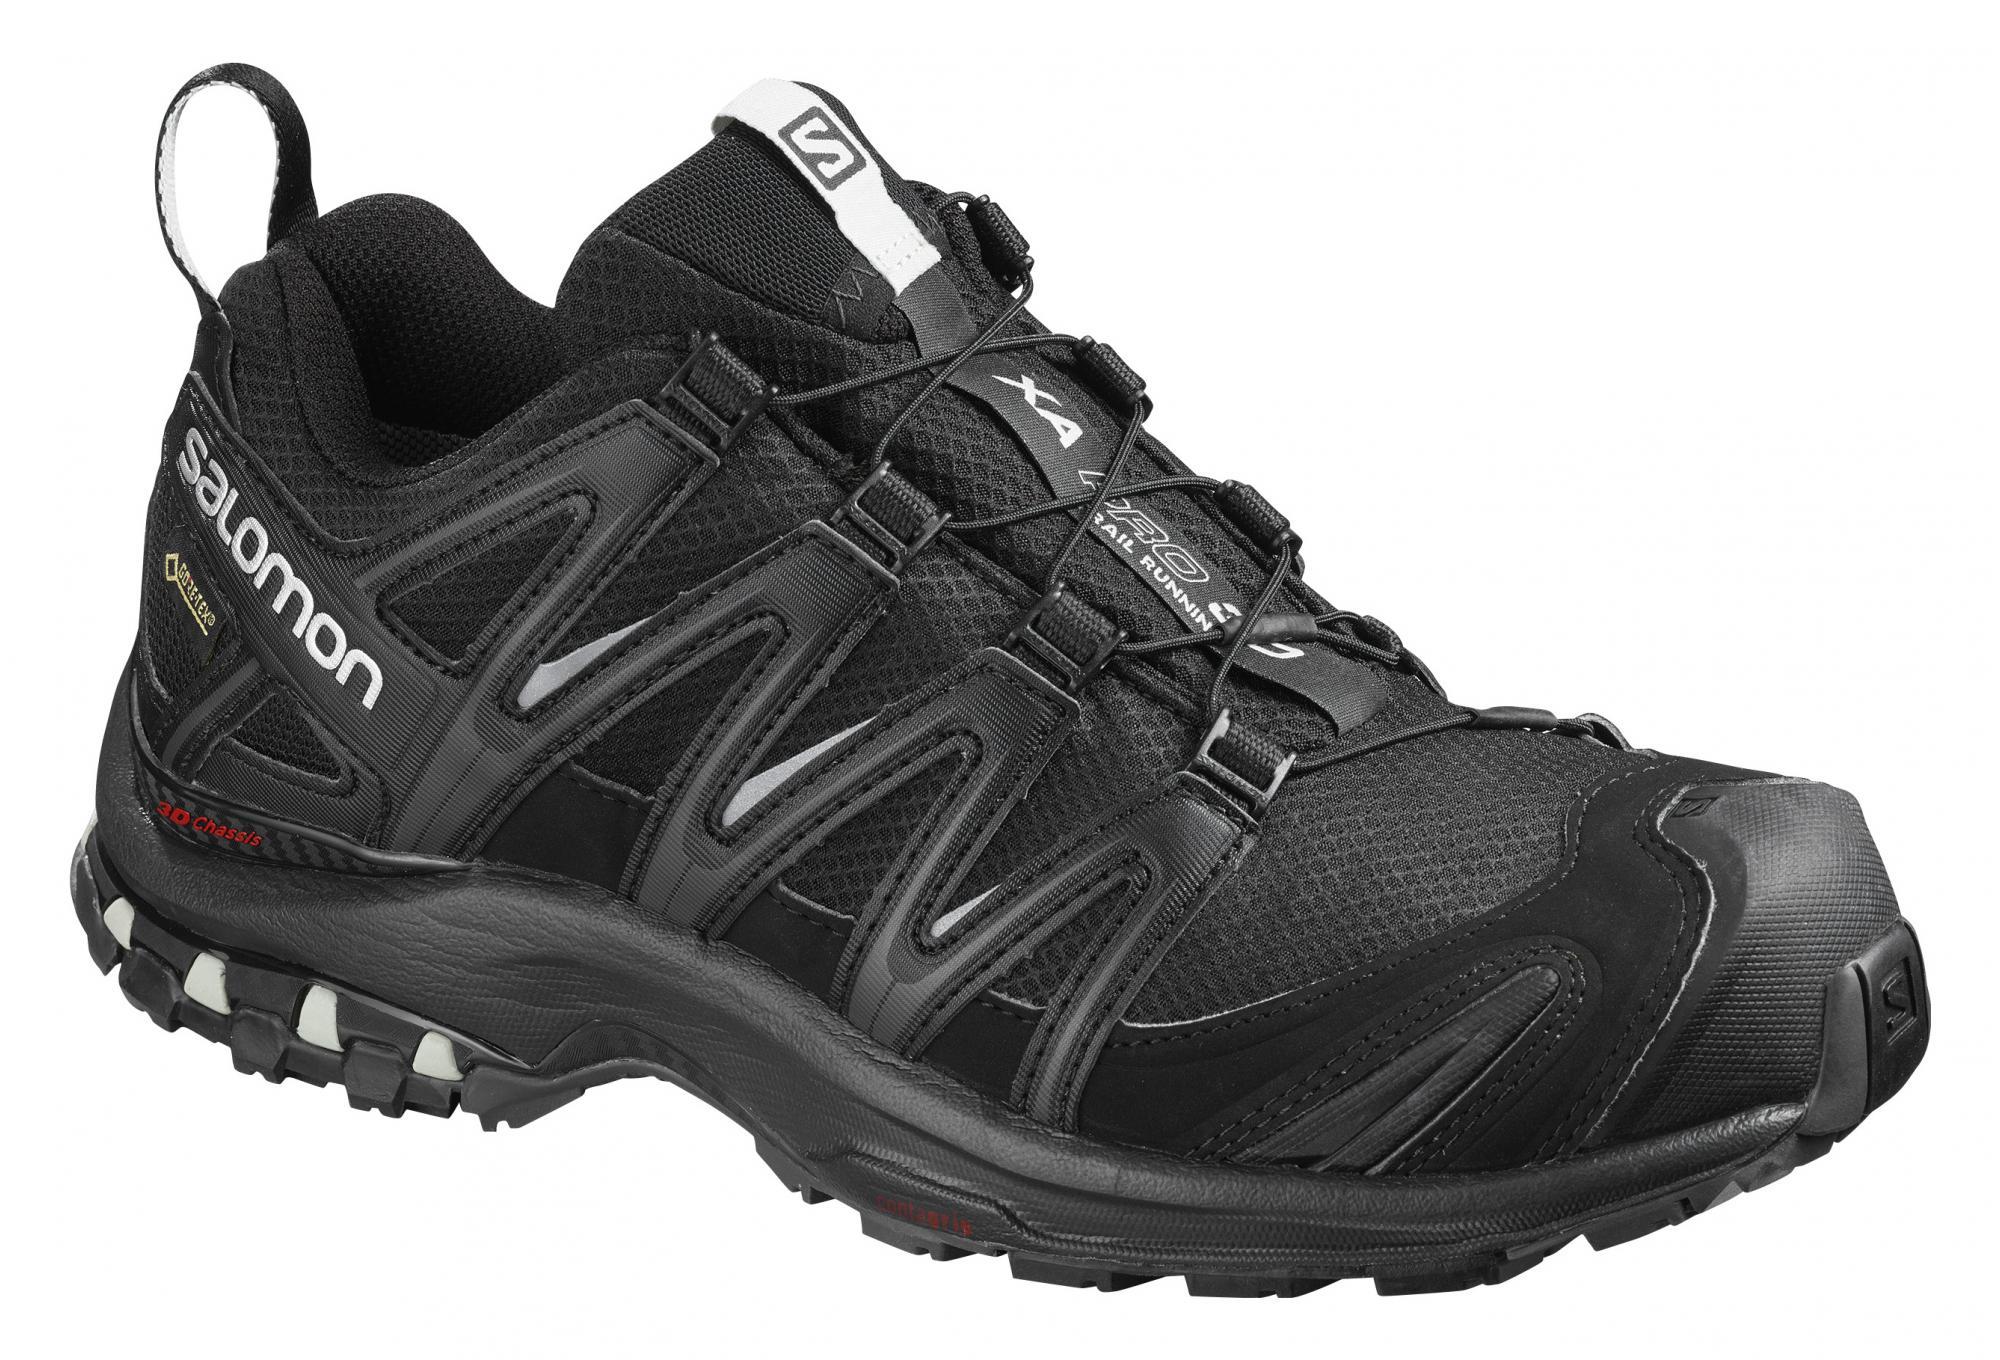 af08a80cf3 Salomon Xa Pro 3D Gtx Shoes